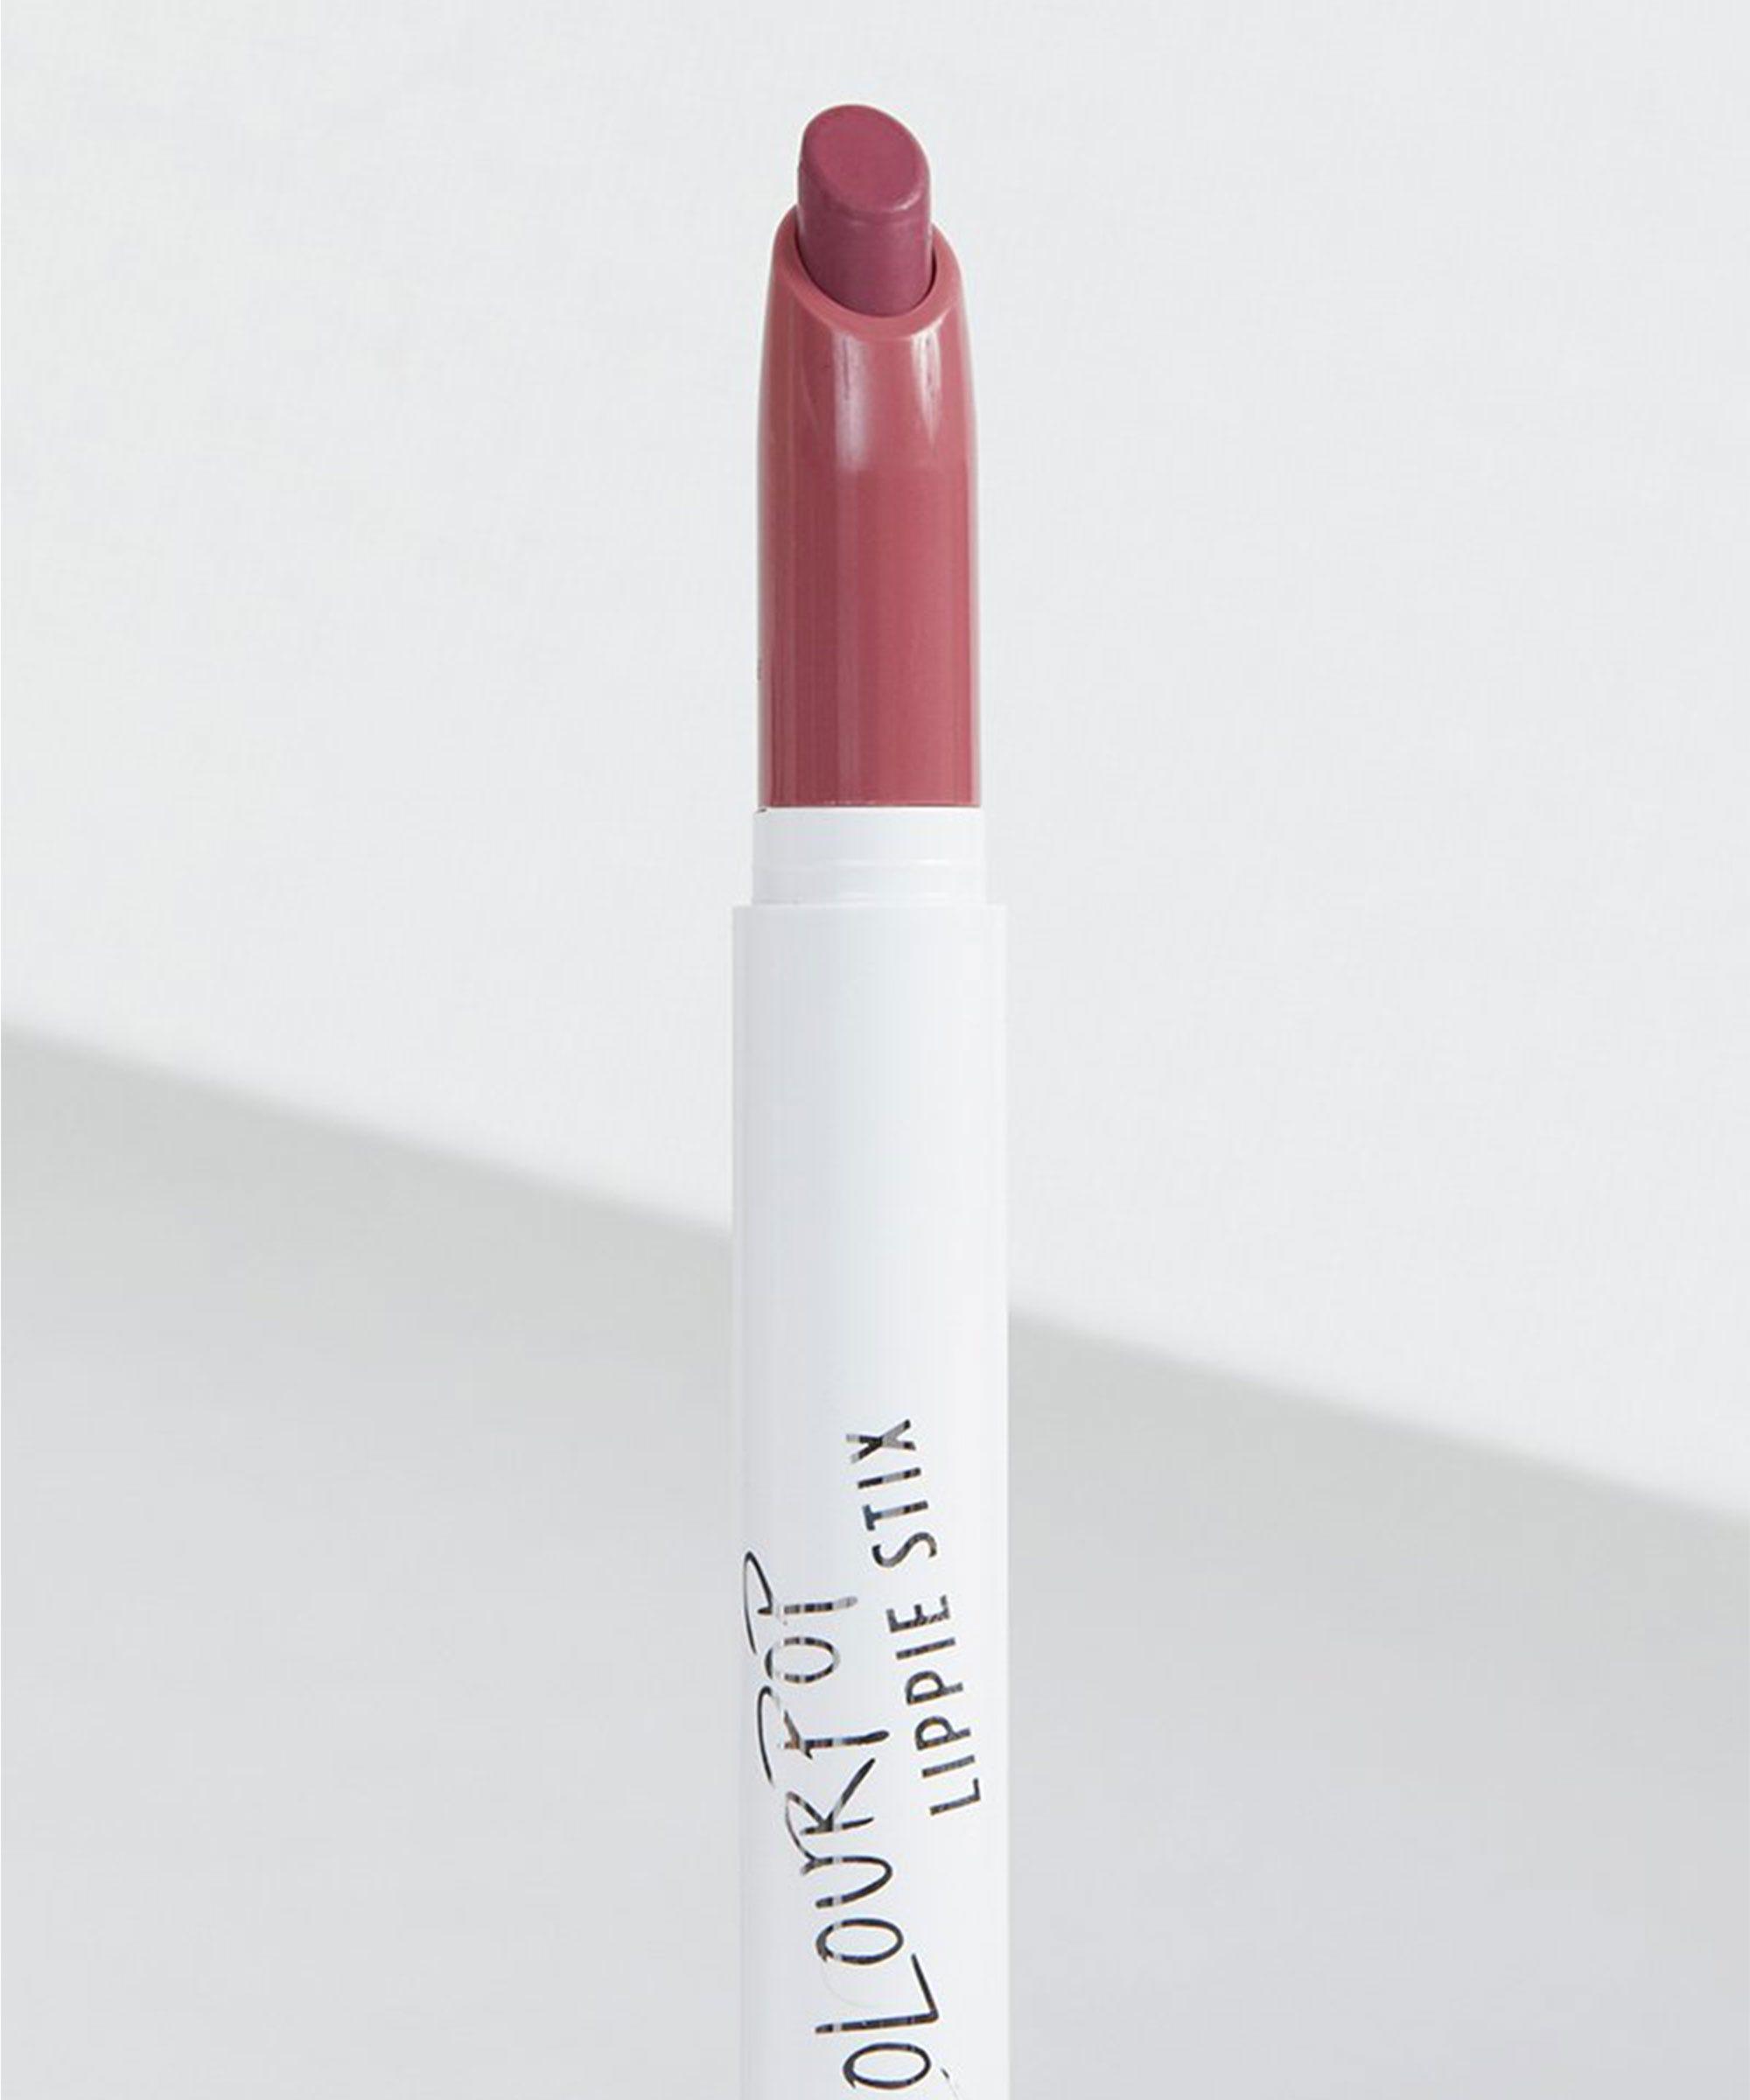 Gigi Hadid Maybelline Matte Lipstick Dupes Alternatives